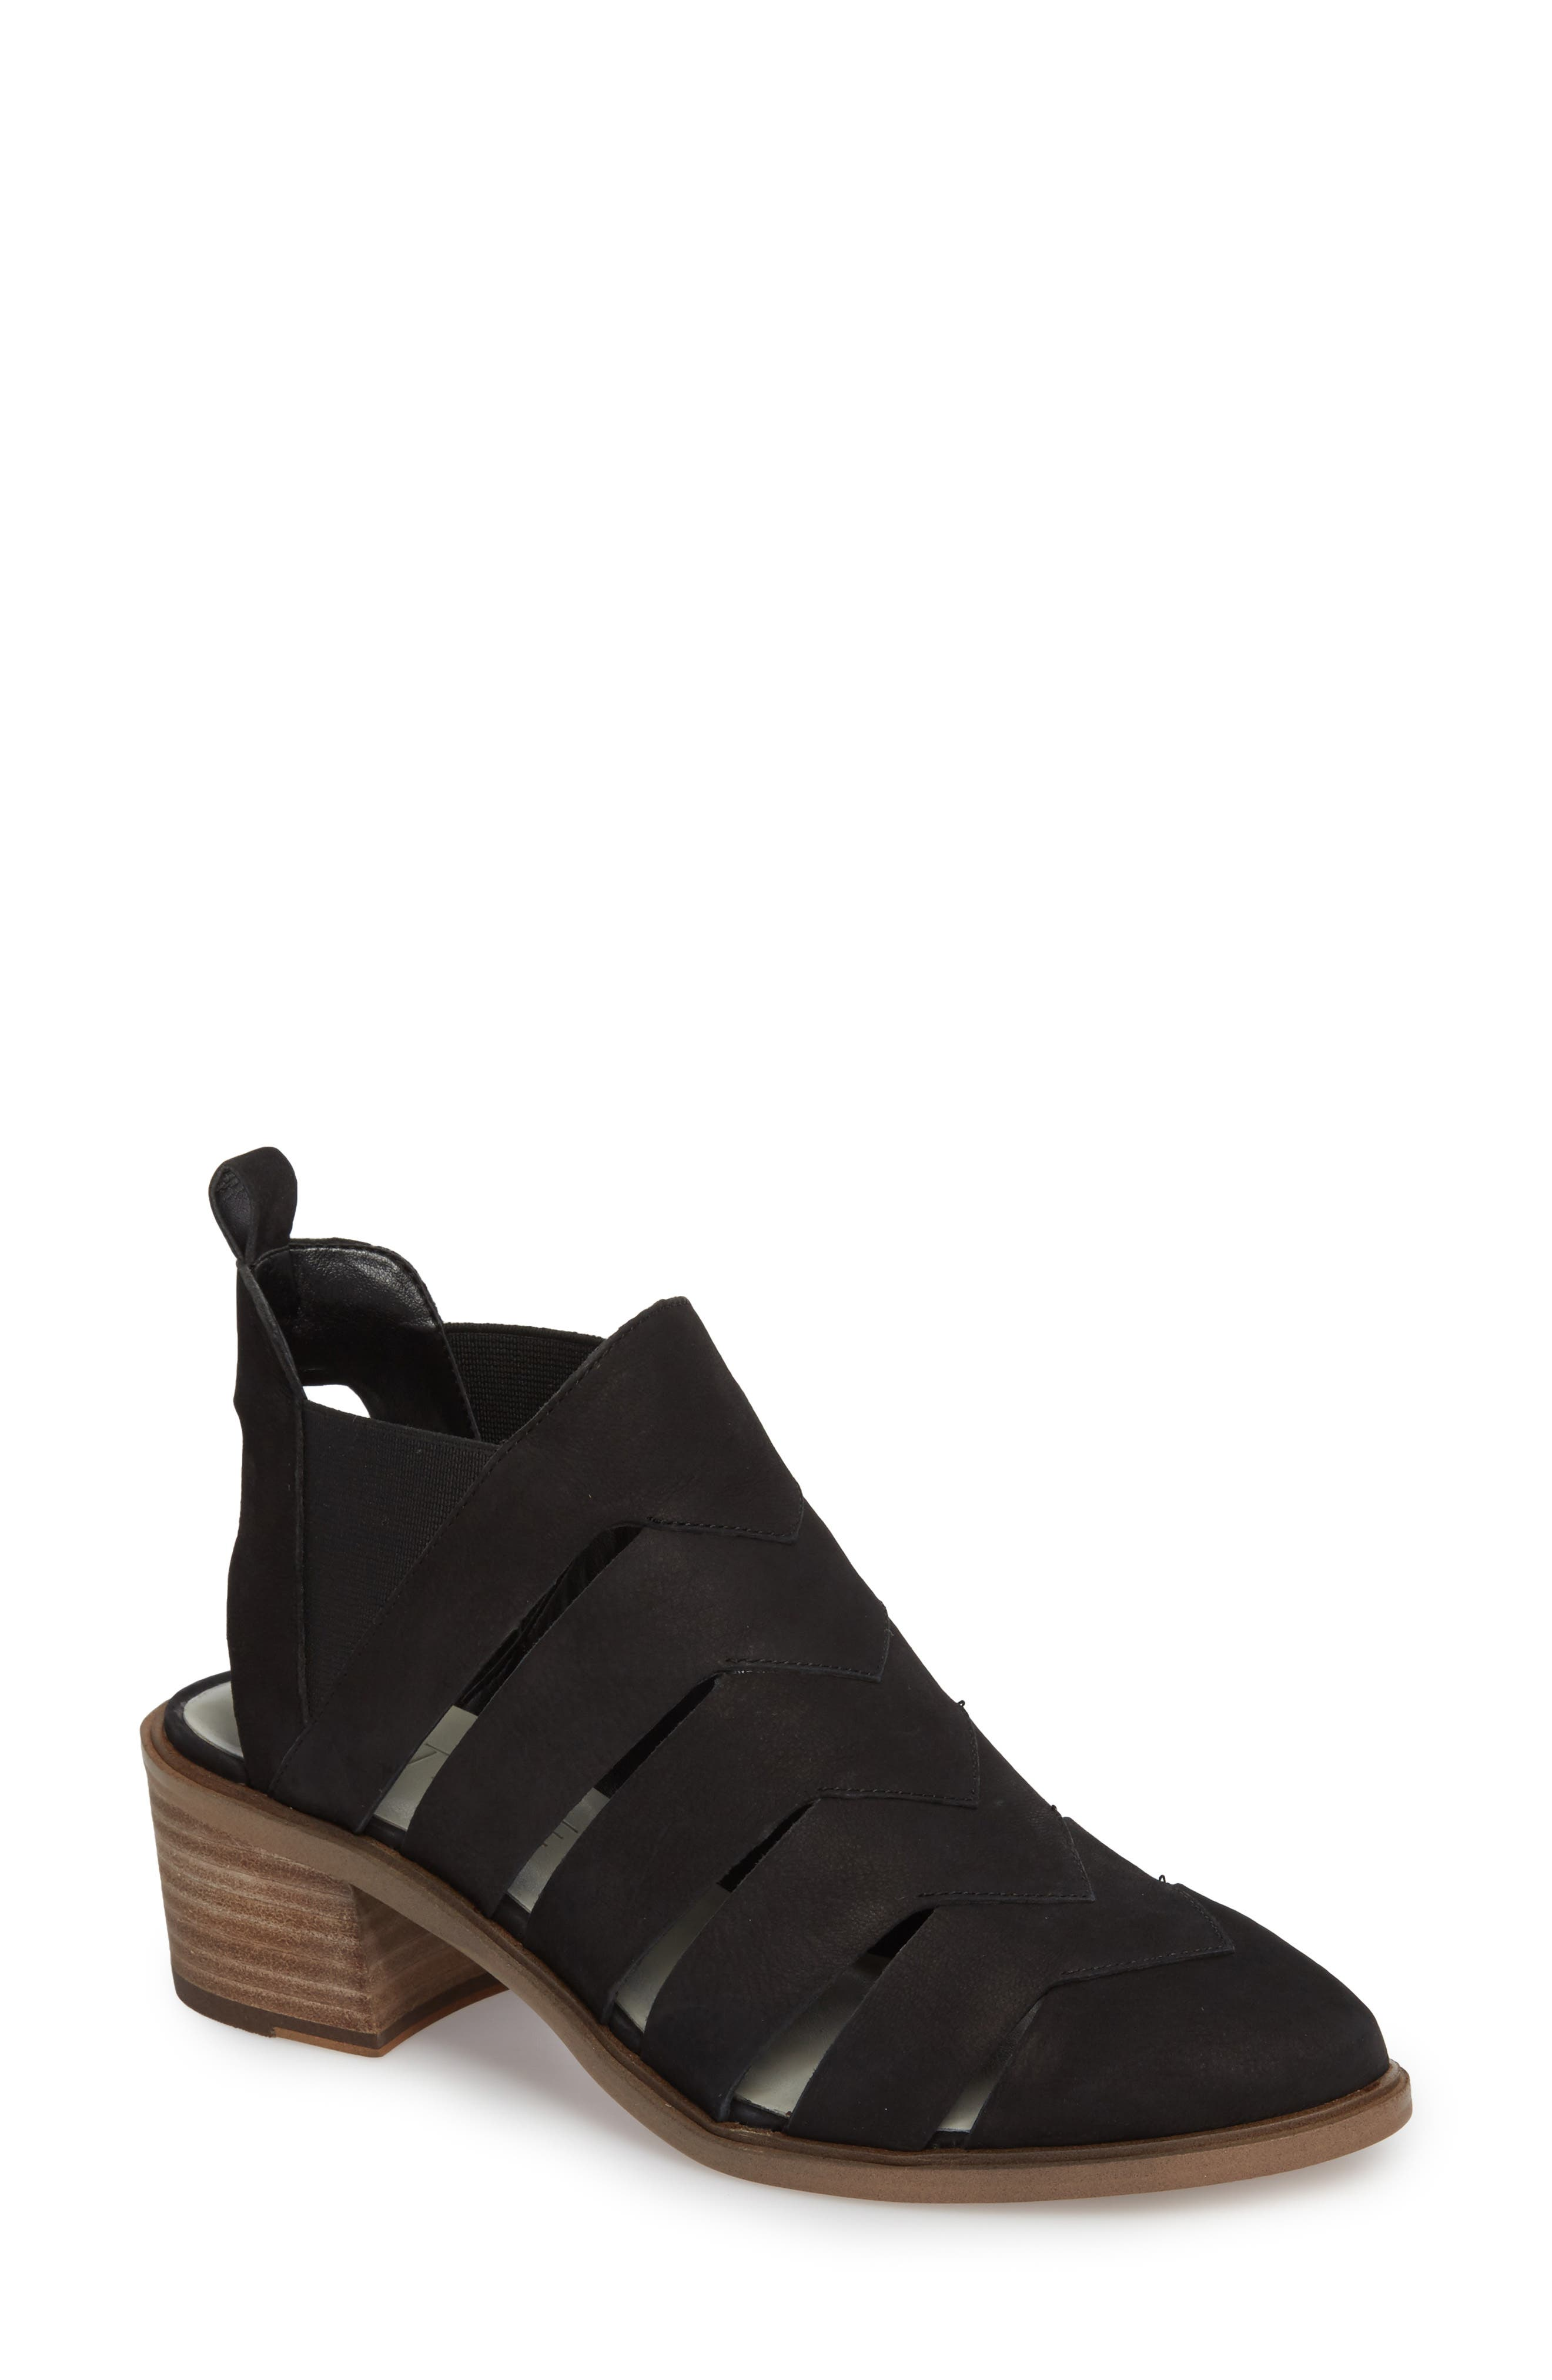 Amilee Bootie,                         Main,                         color, Black Nubuck Leather